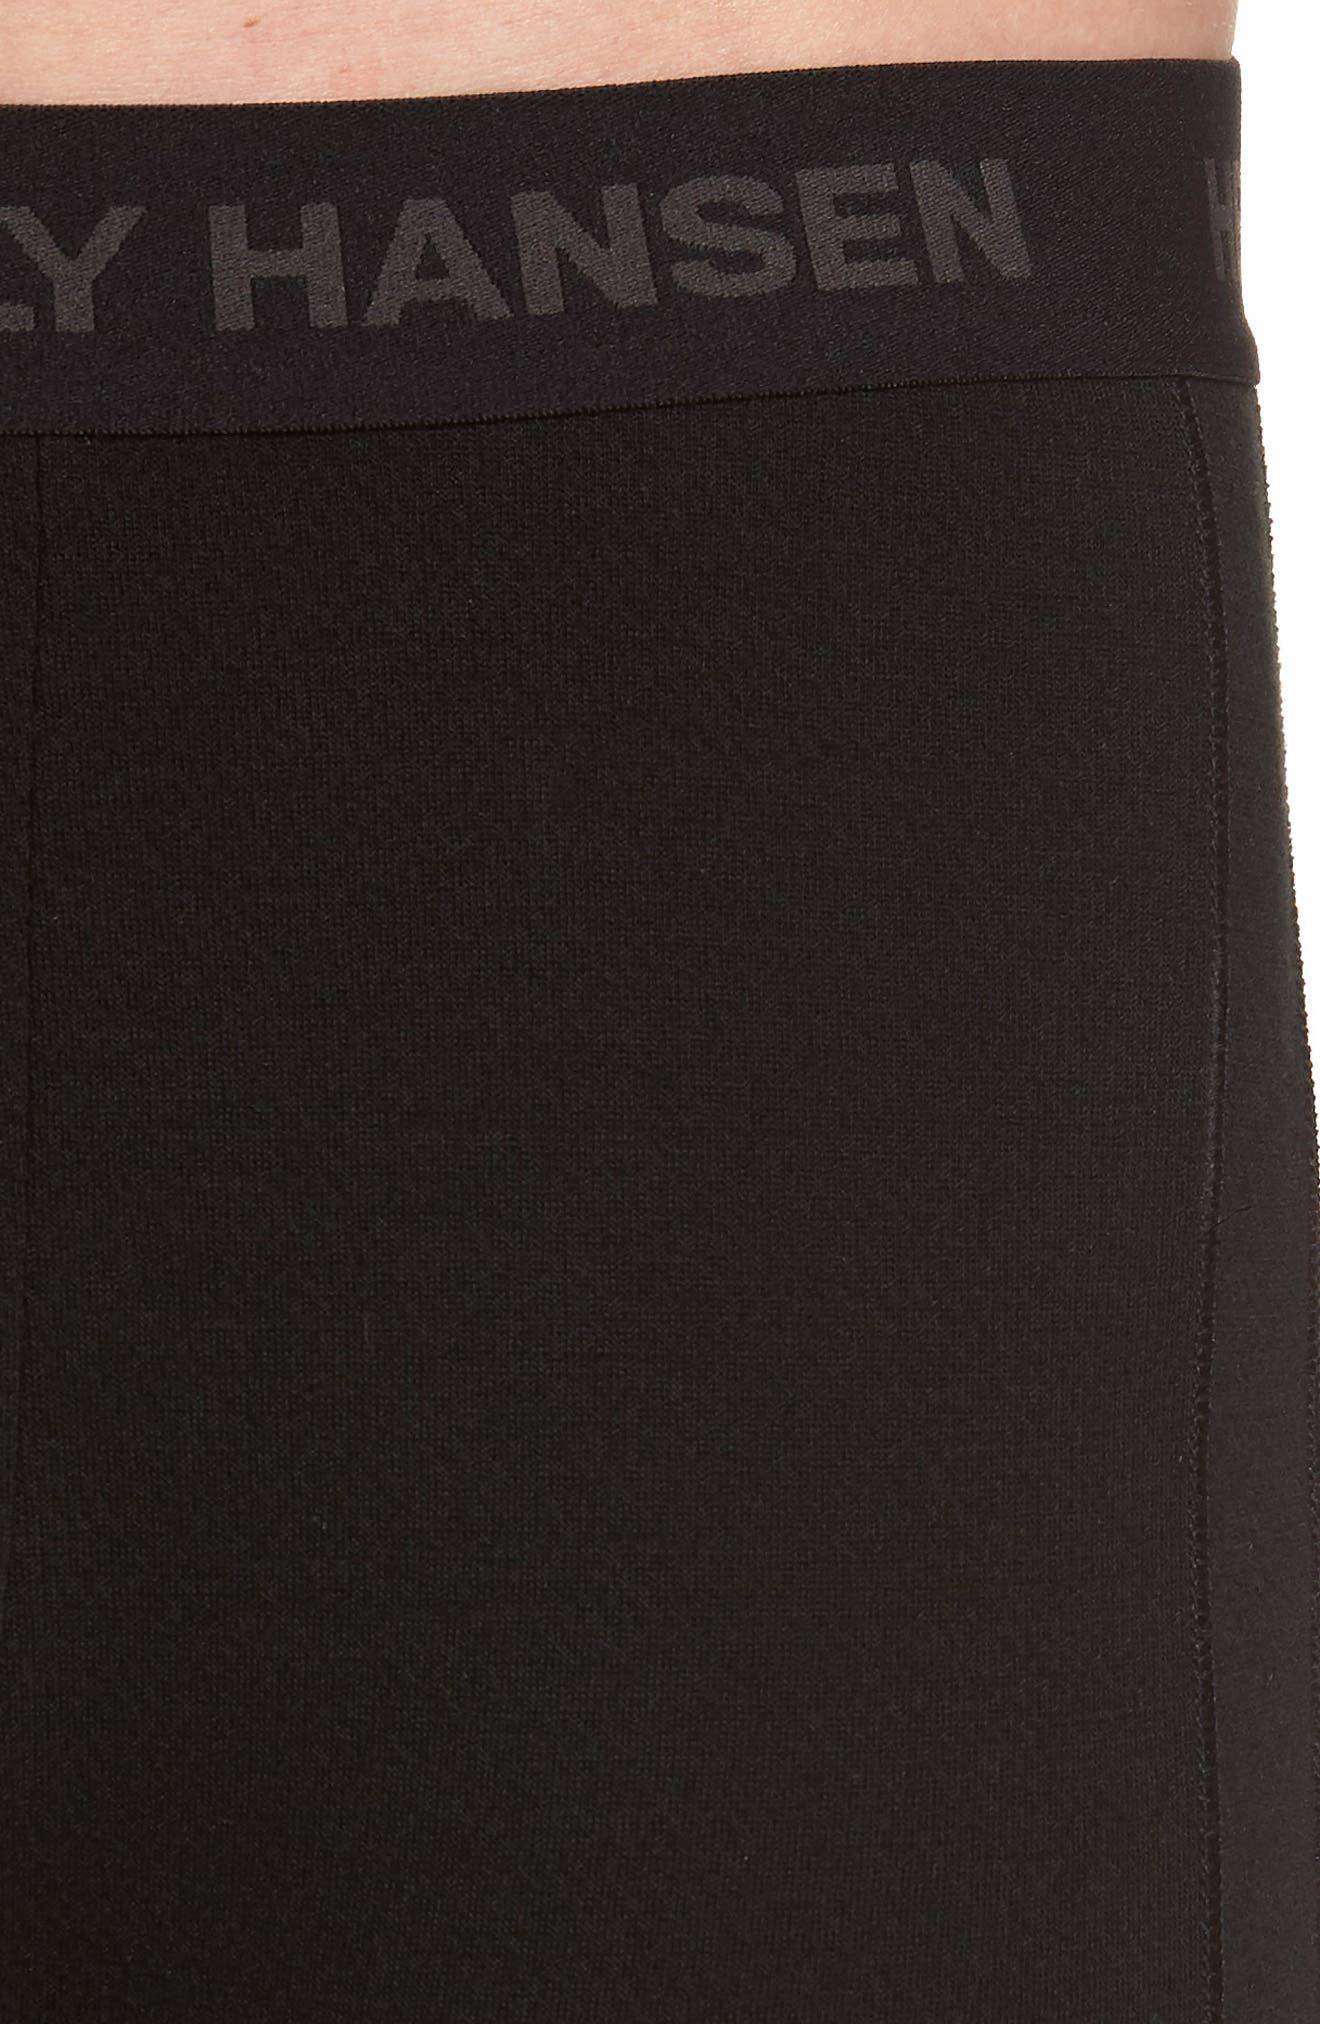 Lifa Merino Wool Blend Tights,                             Alternate thumbnail 4, color,                             Black